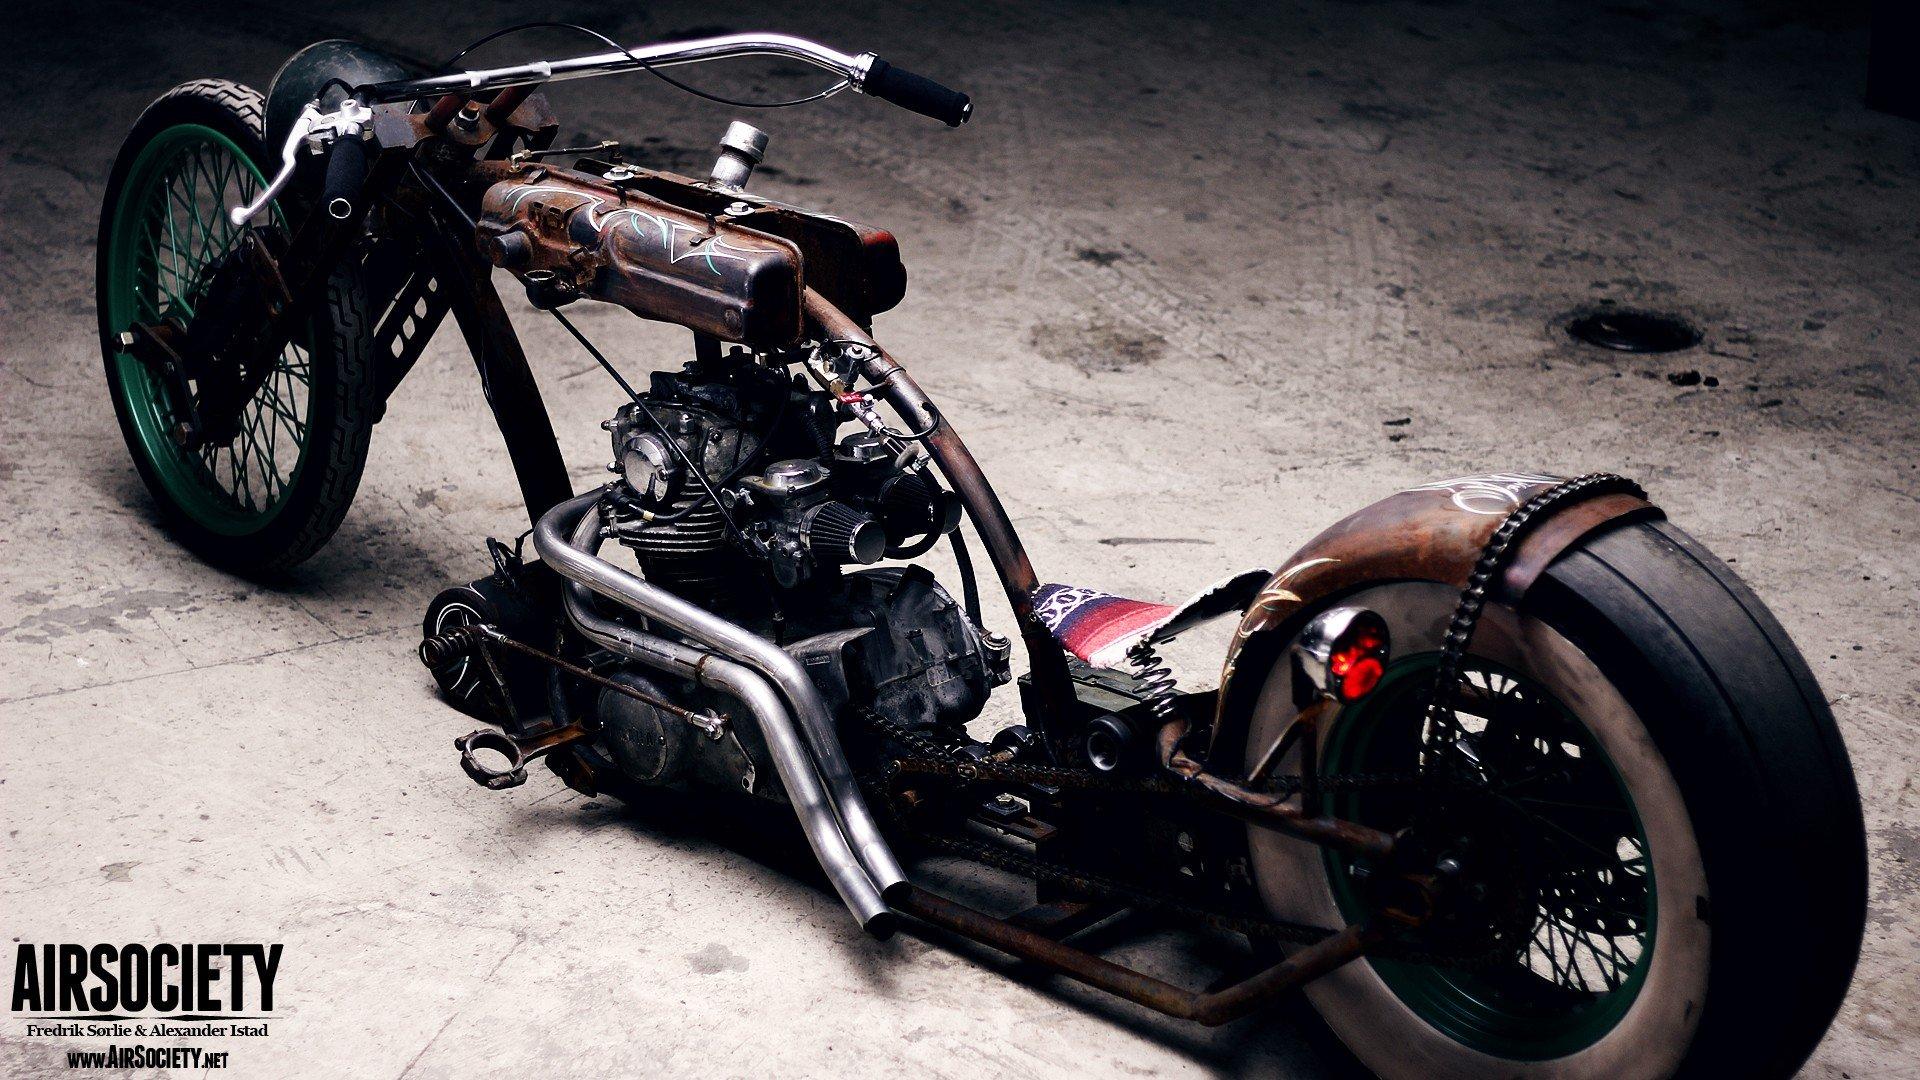 bike engines chopper ride yamaha rust suspension motorbikes air